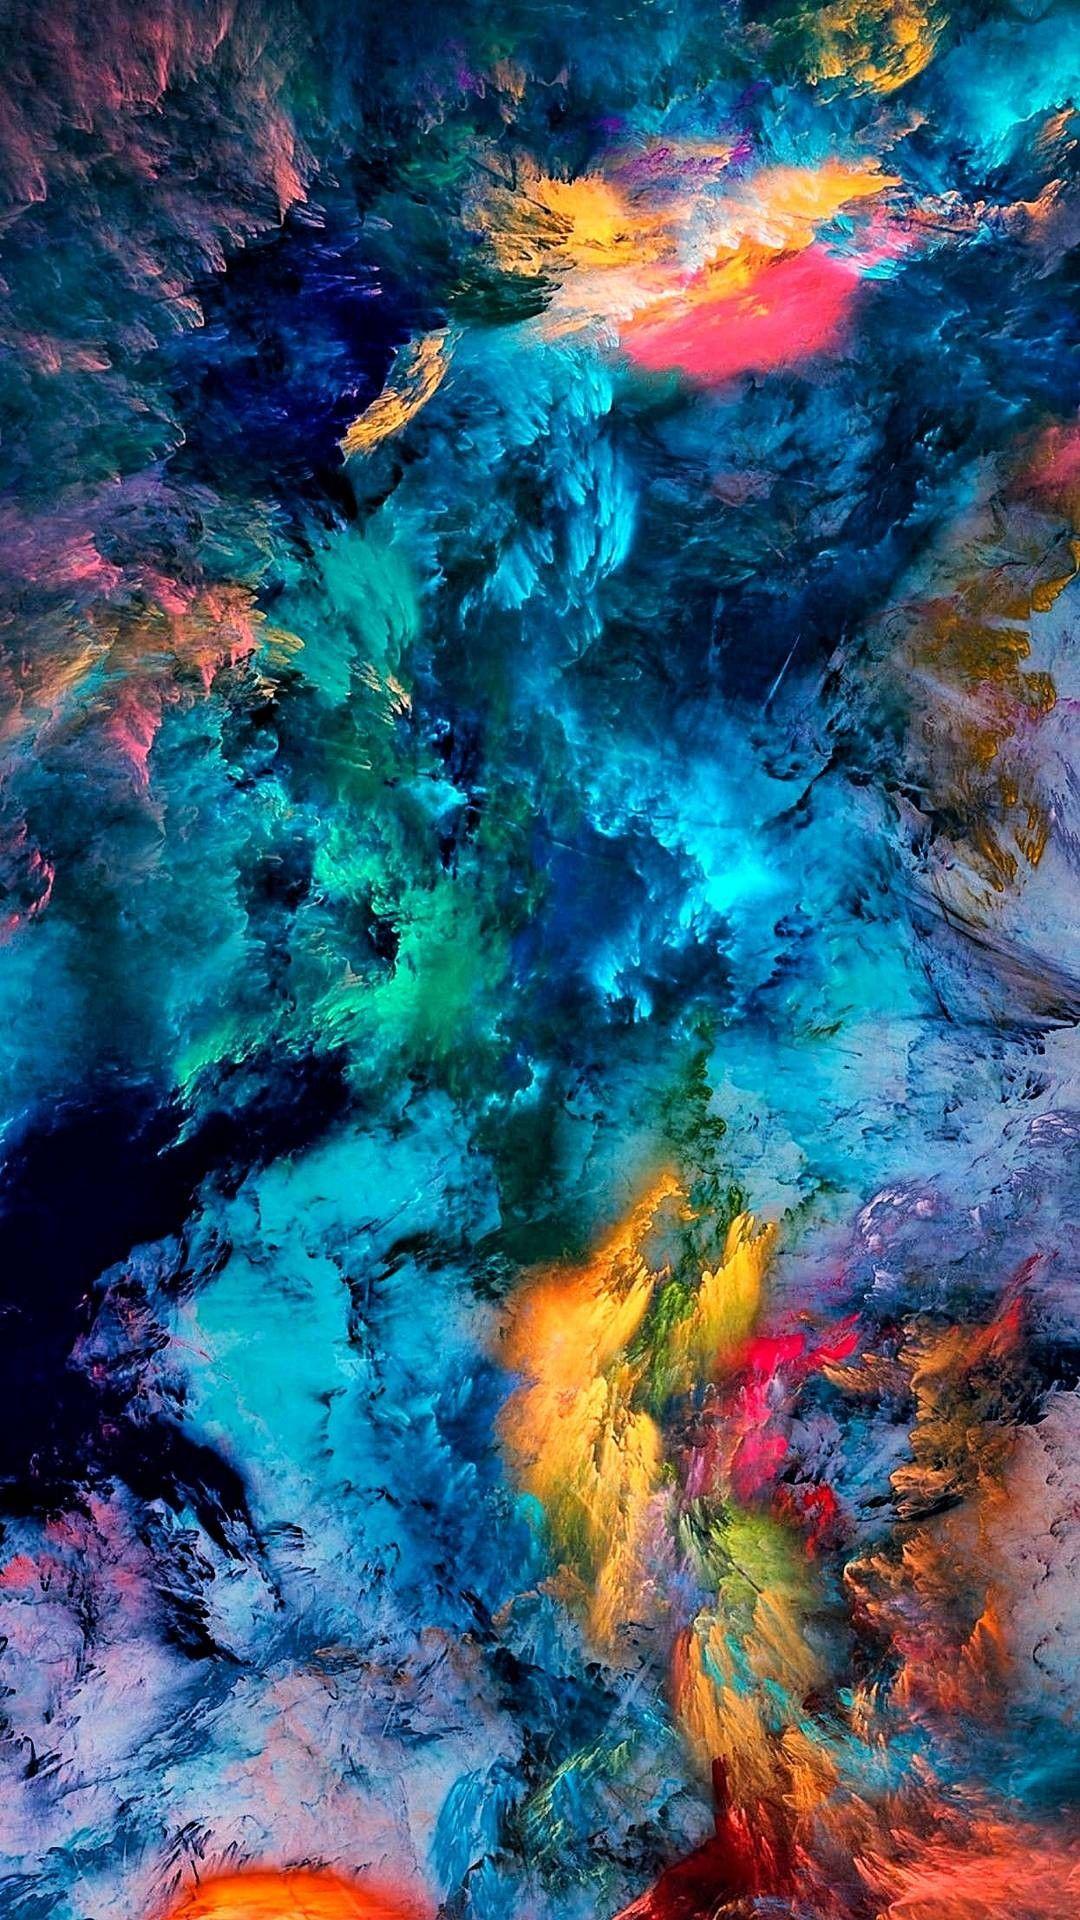 Beyond Crayola Storm wallpaper, Iphone 7 plus wallpaper